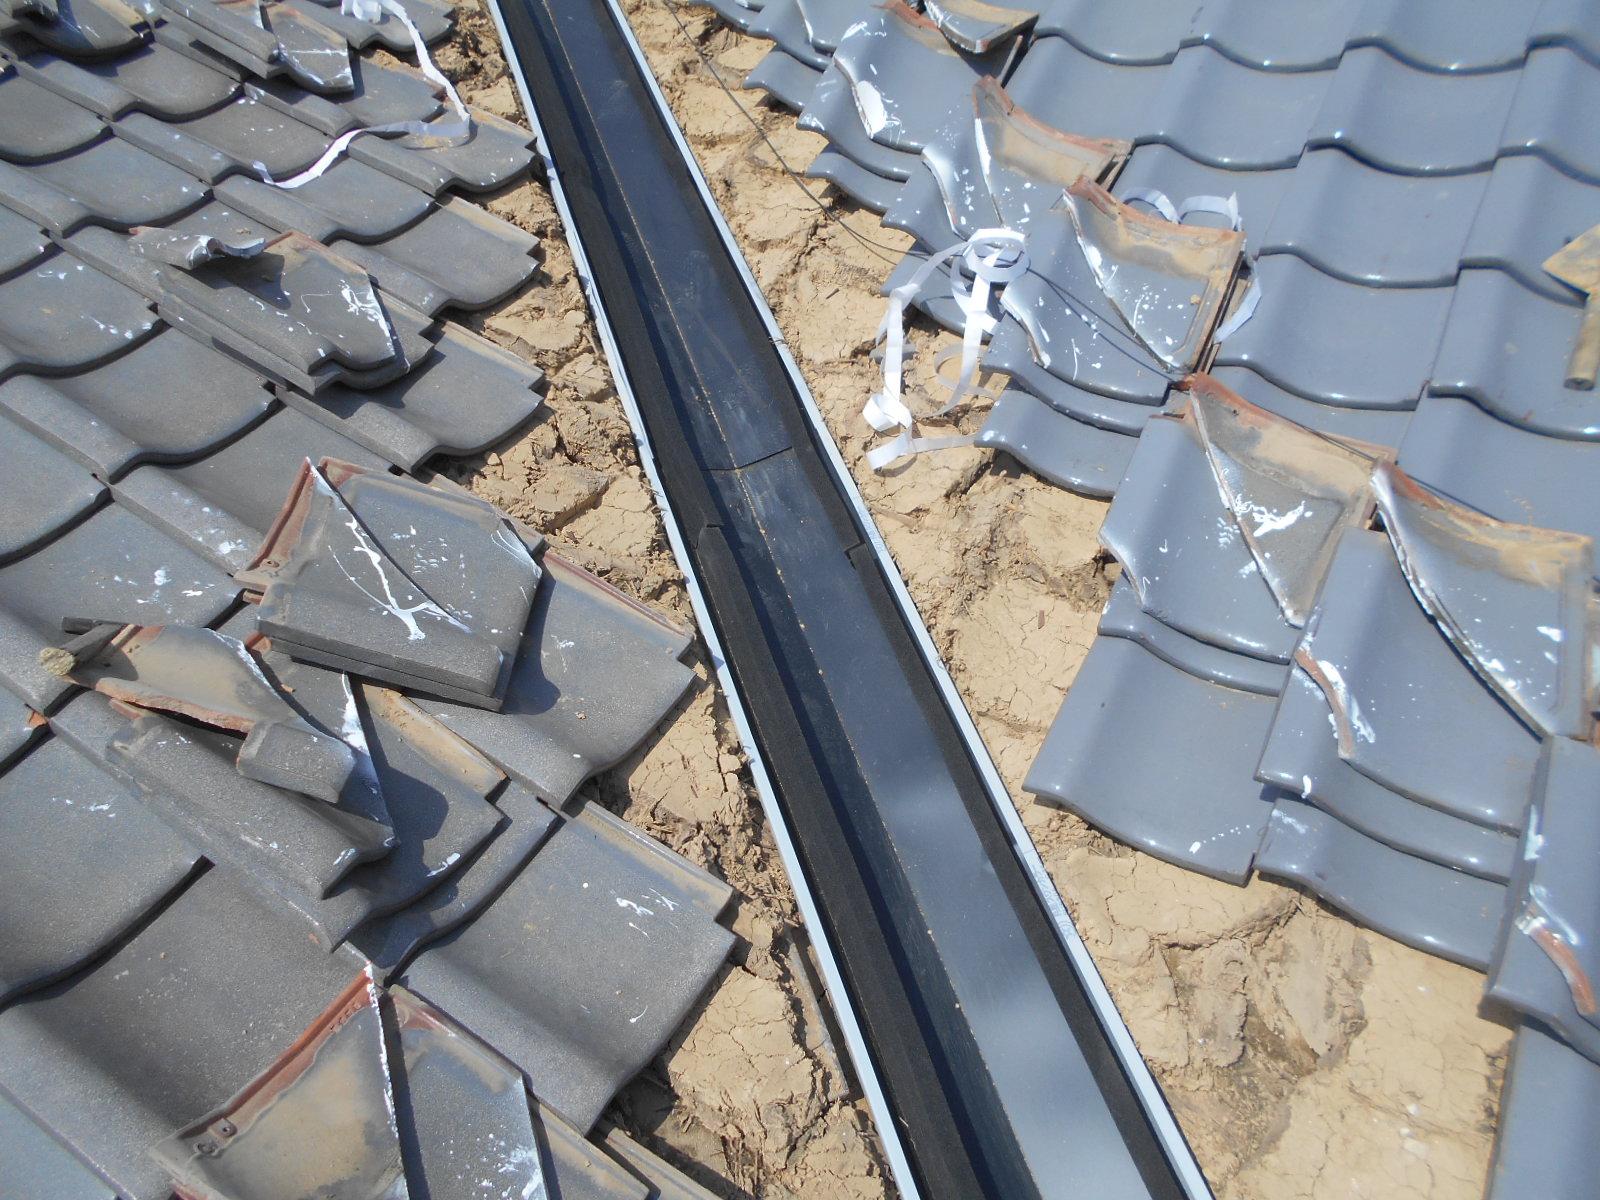 津市雨漏り屋根修理